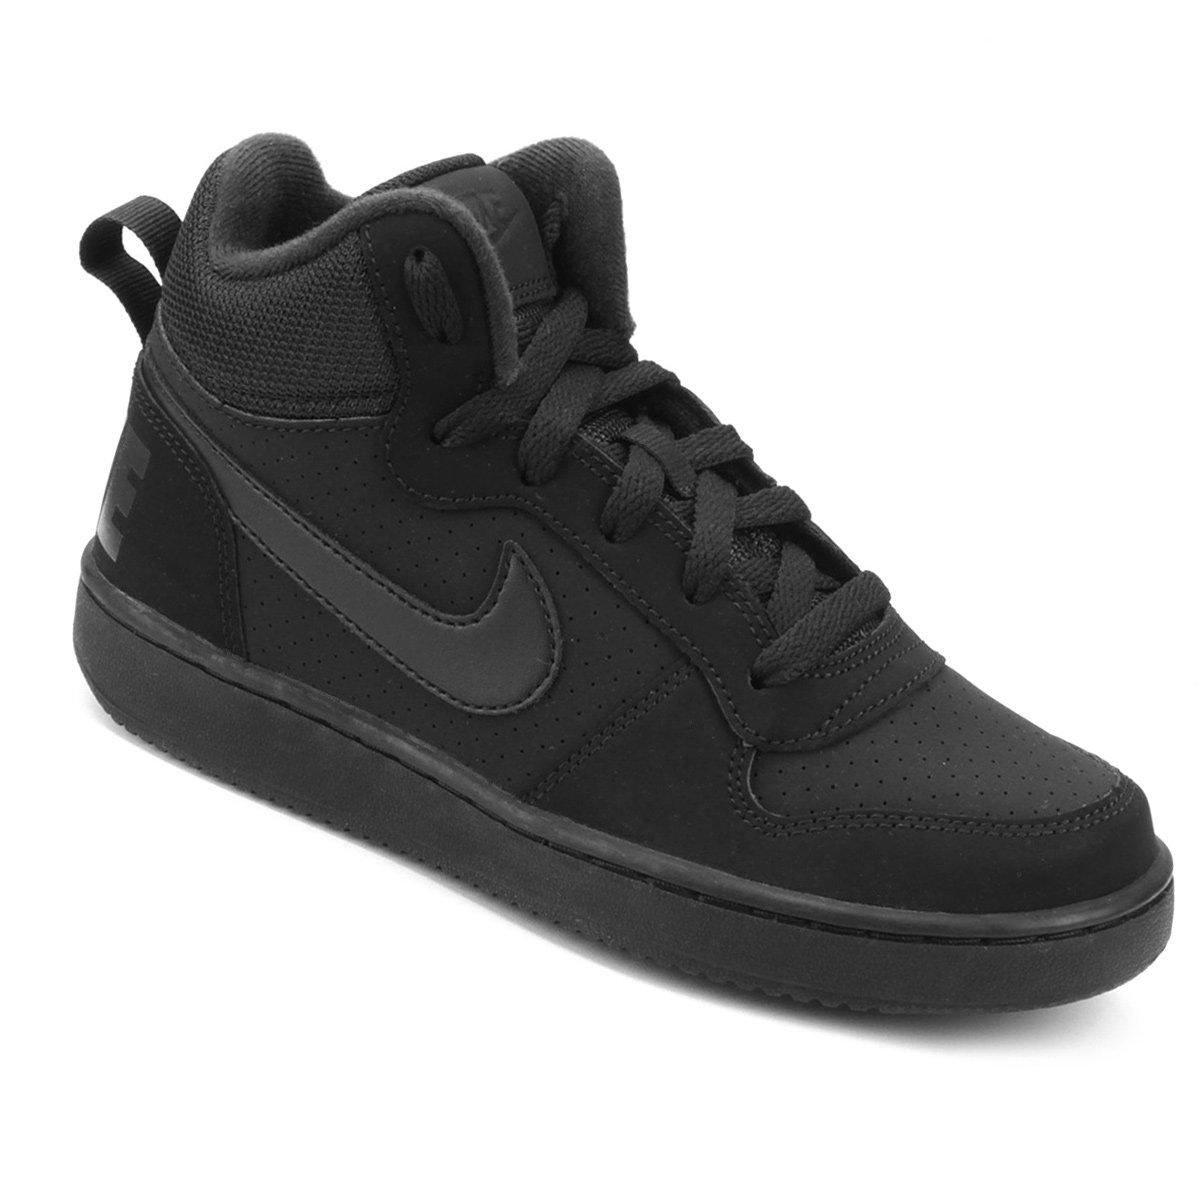 96ba2b4aedcb1 Tênis Infantil Nike Court Borough Mid Masculino - Preto | Shop Timão